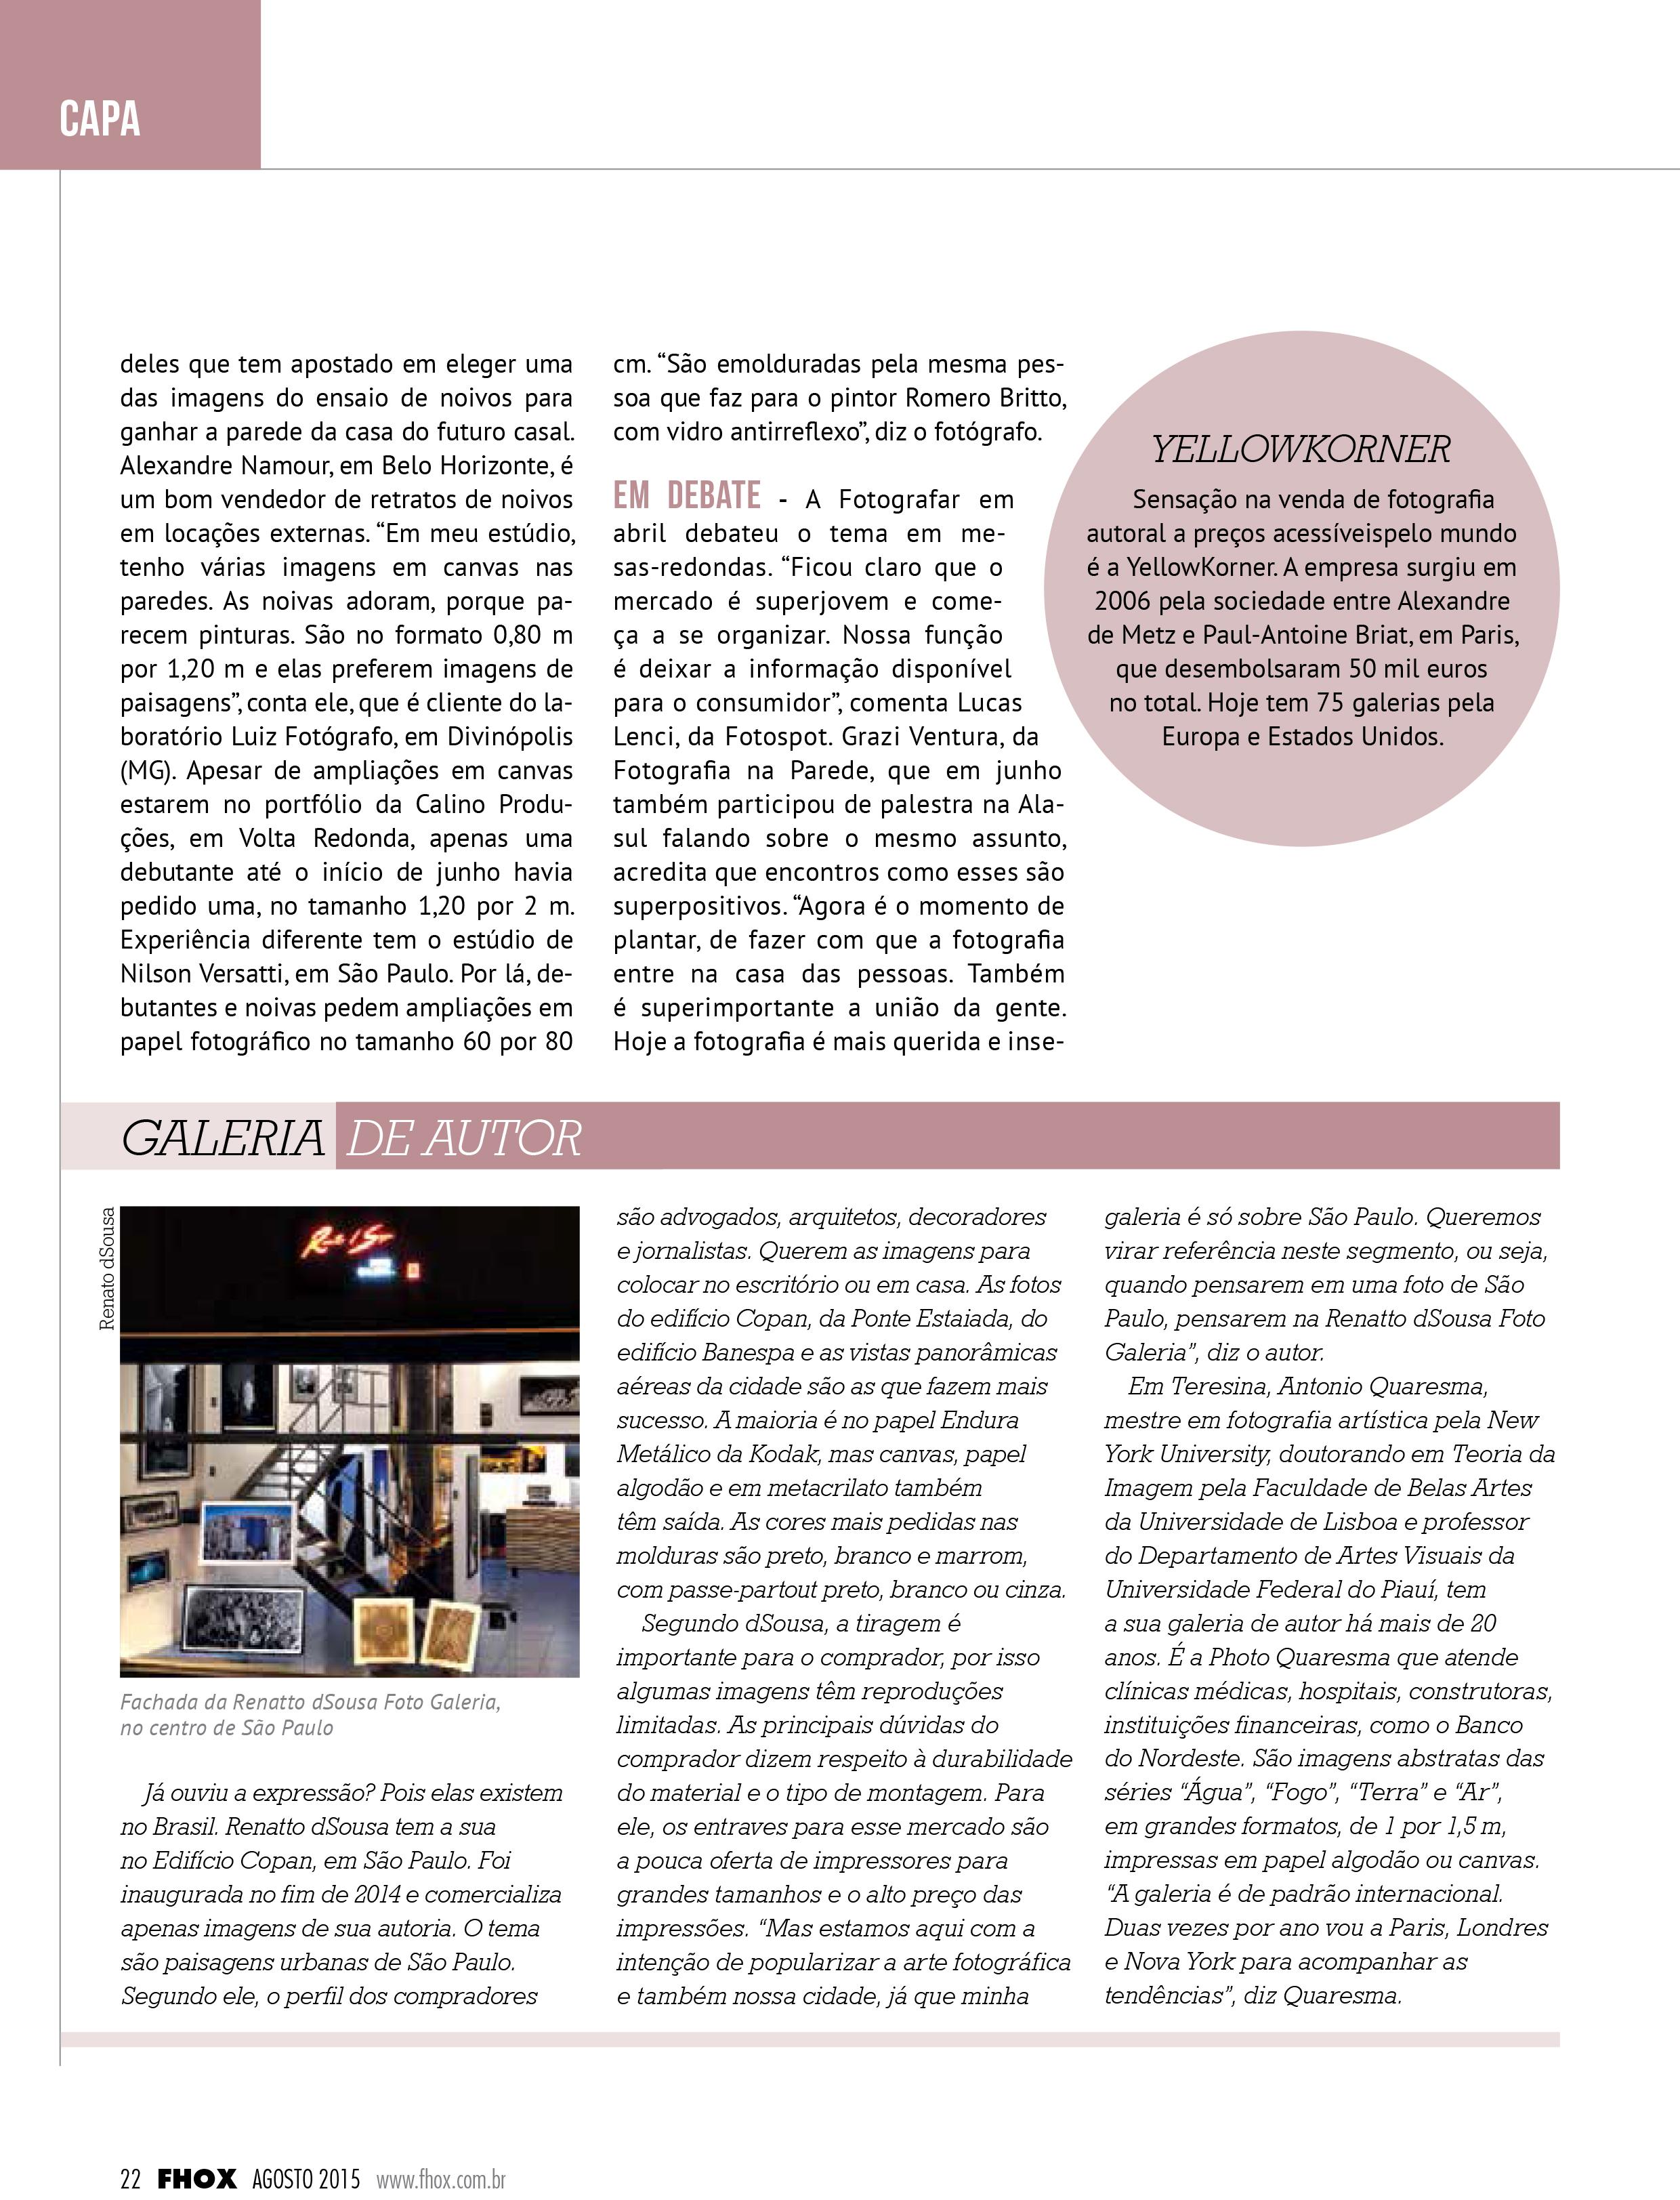 Revista Fhox - página 3